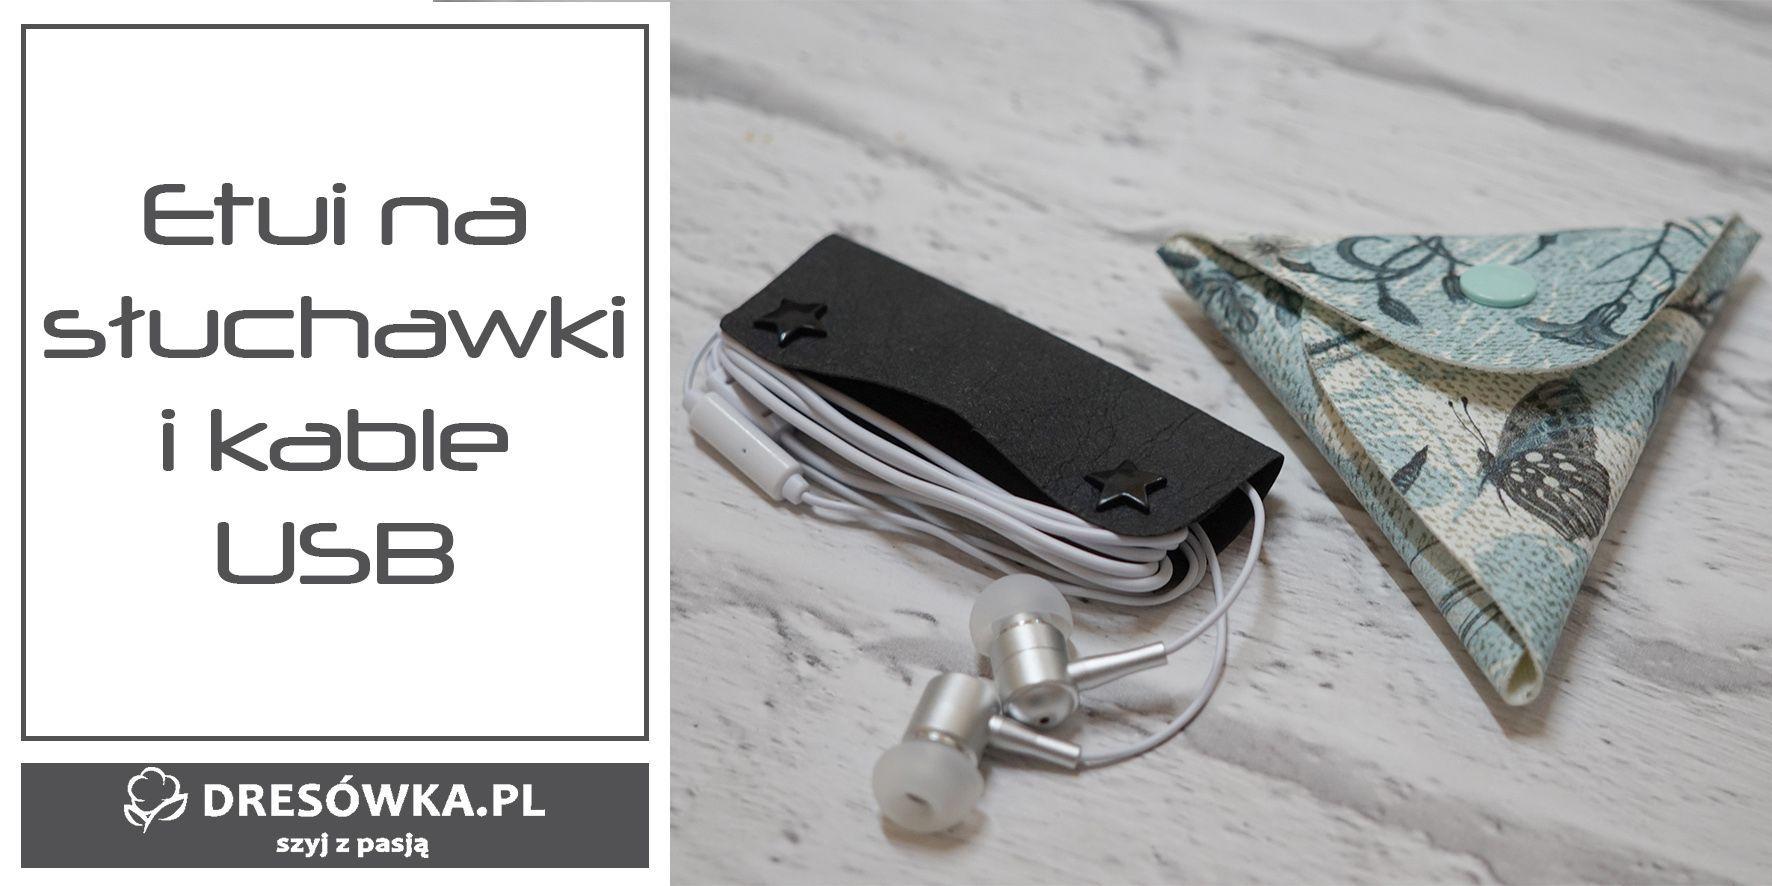 Etui na słuchawki, kable USB i drobiazgi